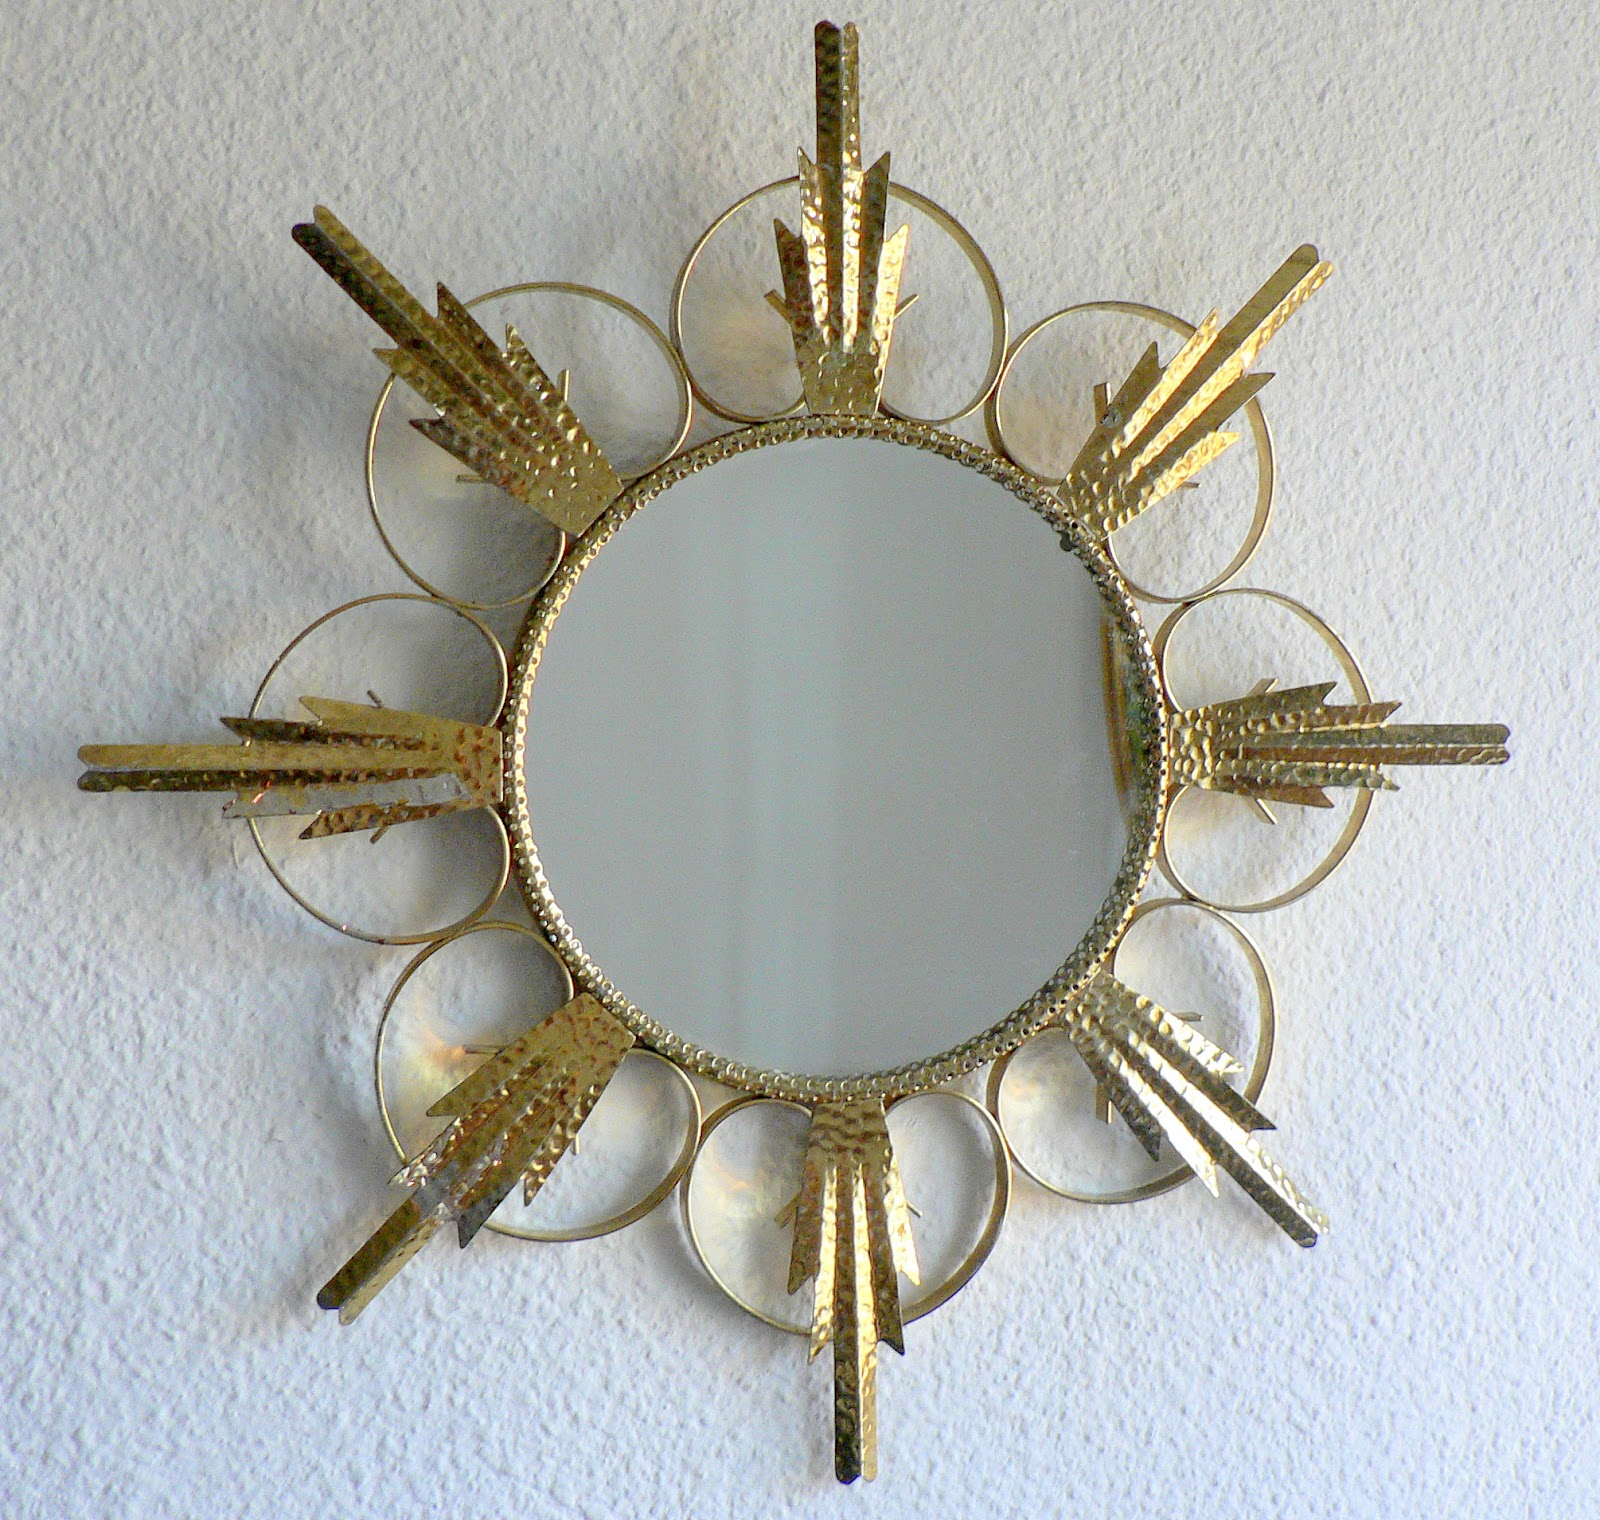 Vintage kitsch siglo xx espejo sol dorado metalico a os 50 for Espejo dorado